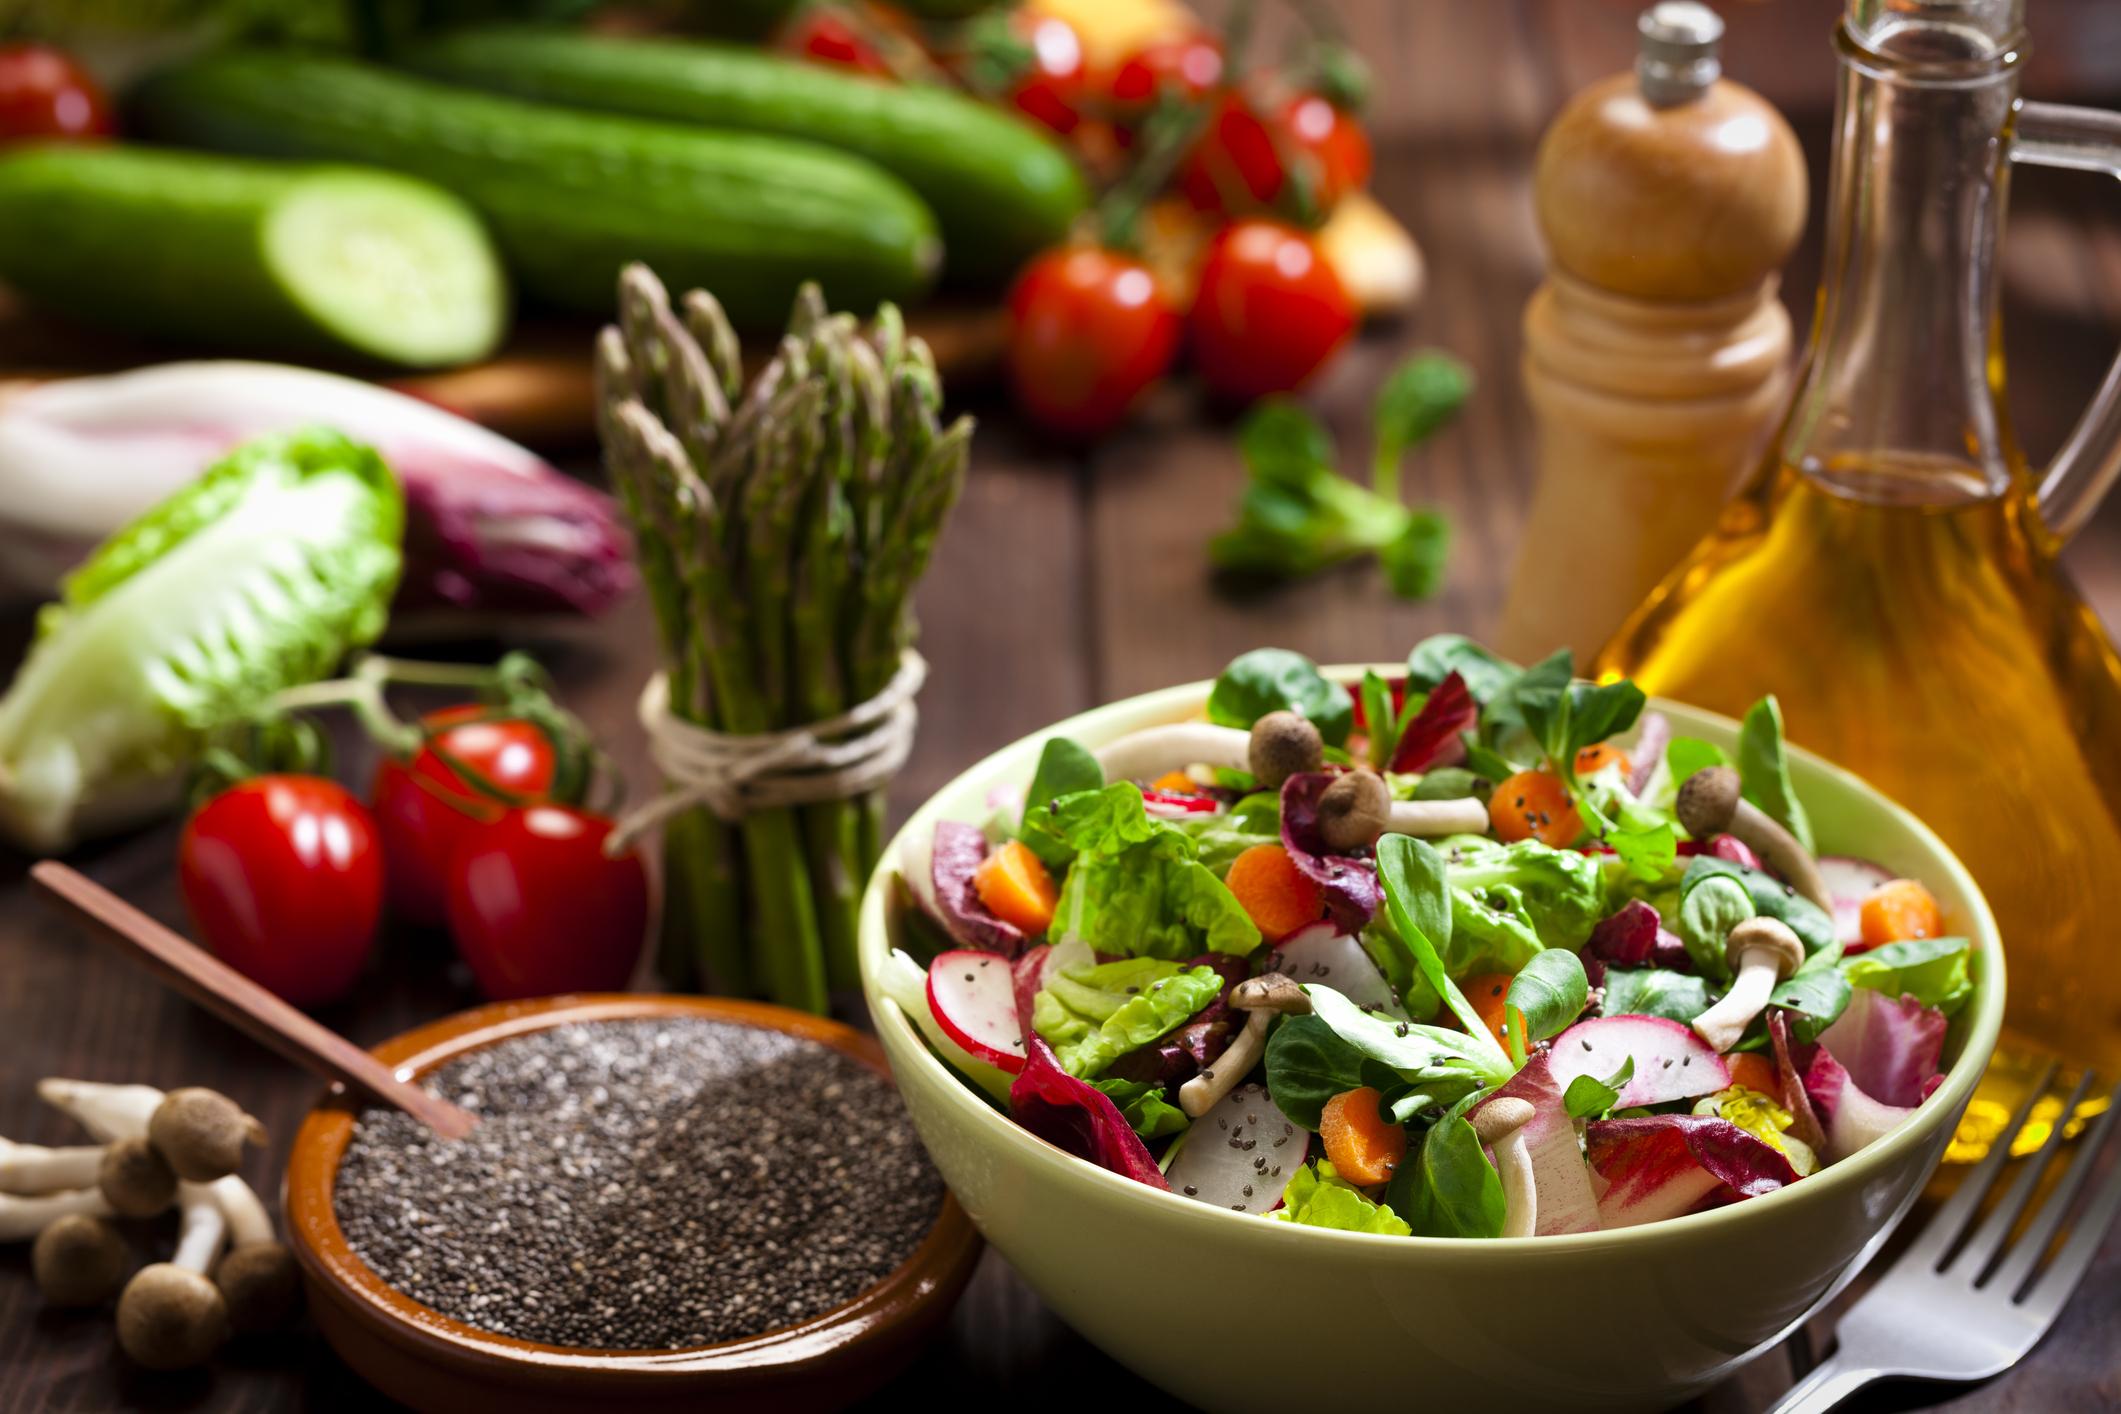 vegan salad ingredients - 31 delicious vegan recipes for Veganuary 2018